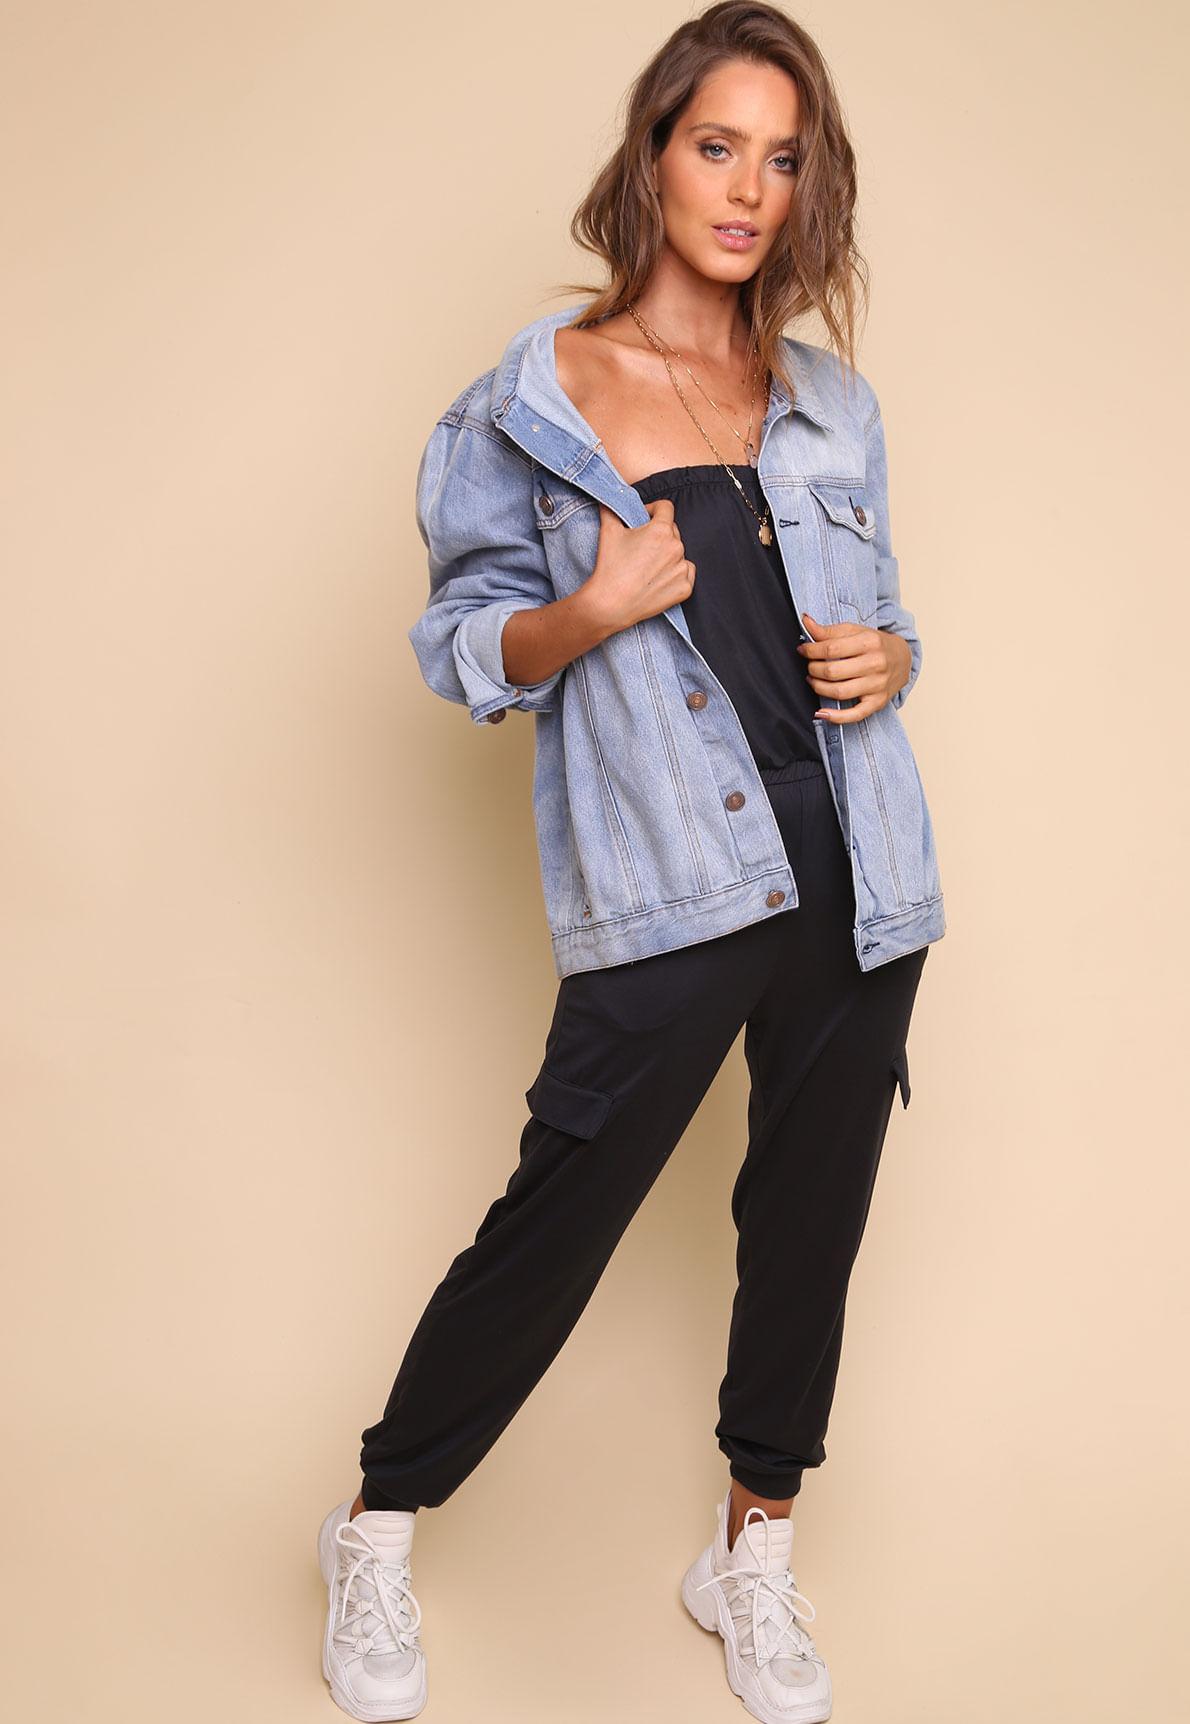 29571-jaqueta-jeans-oversized-abby-mundo-lolita-12